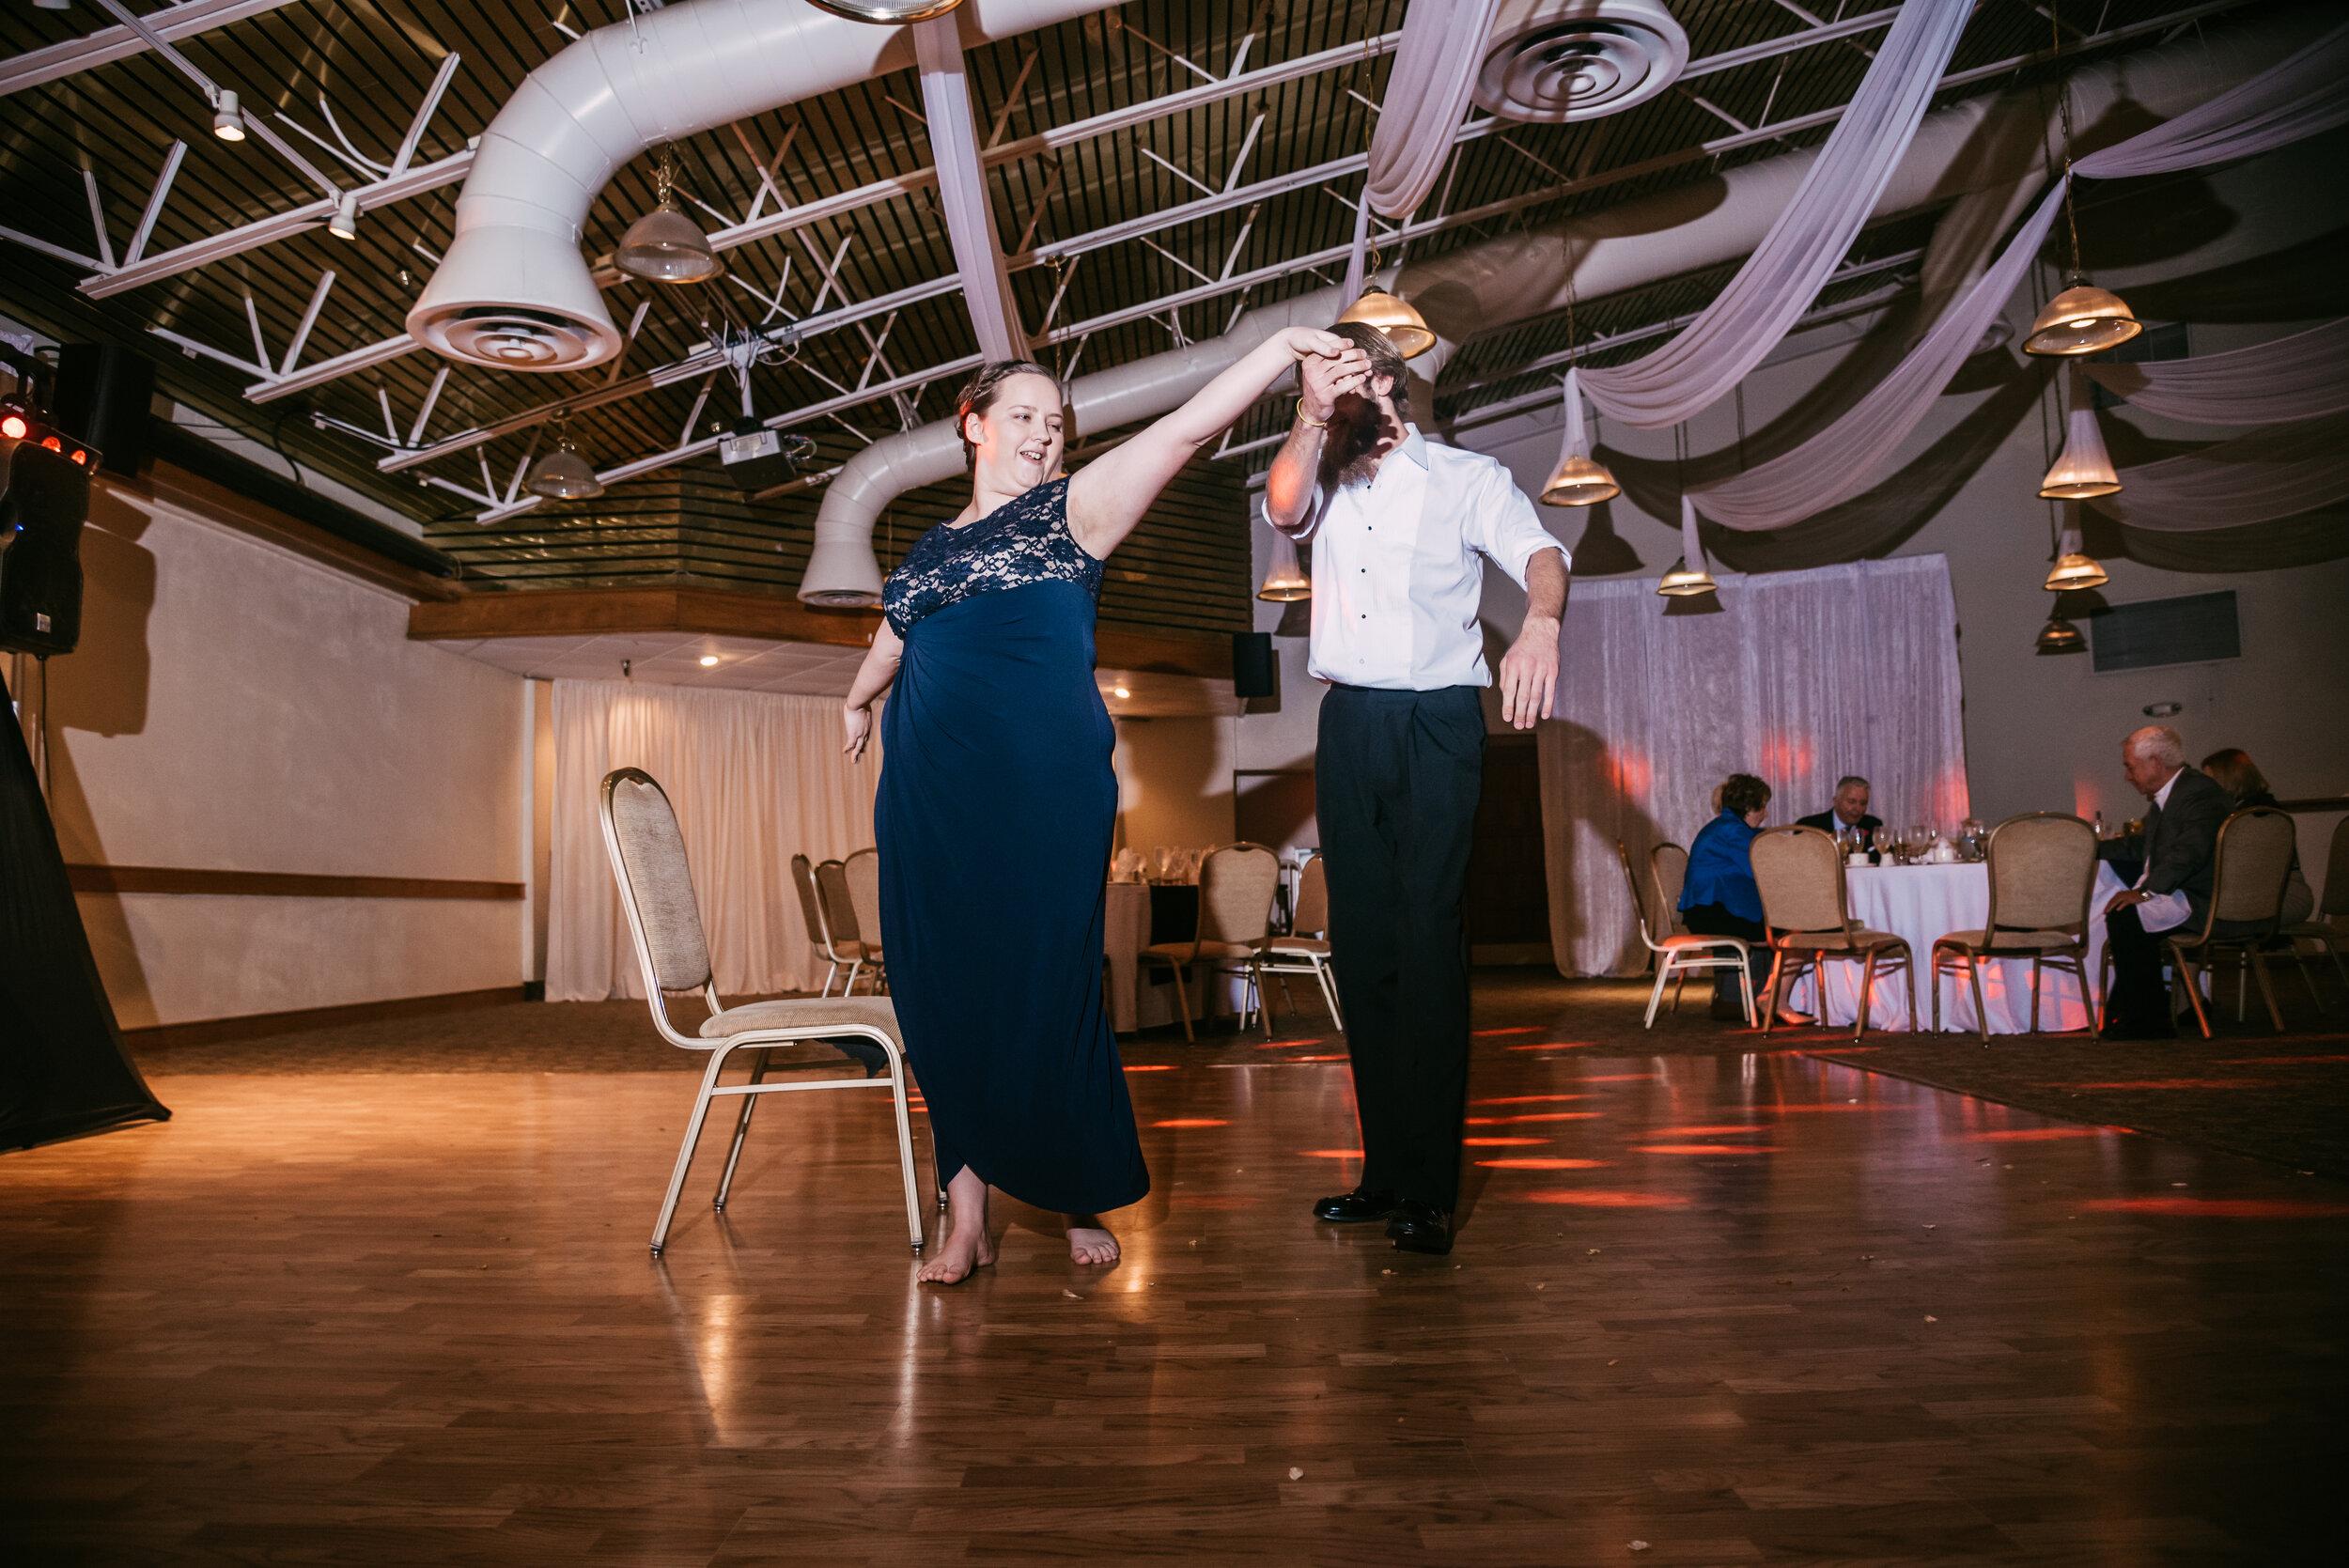 andru-the-tide-club-air-force-wedding-patrickafb-1-174.jpg